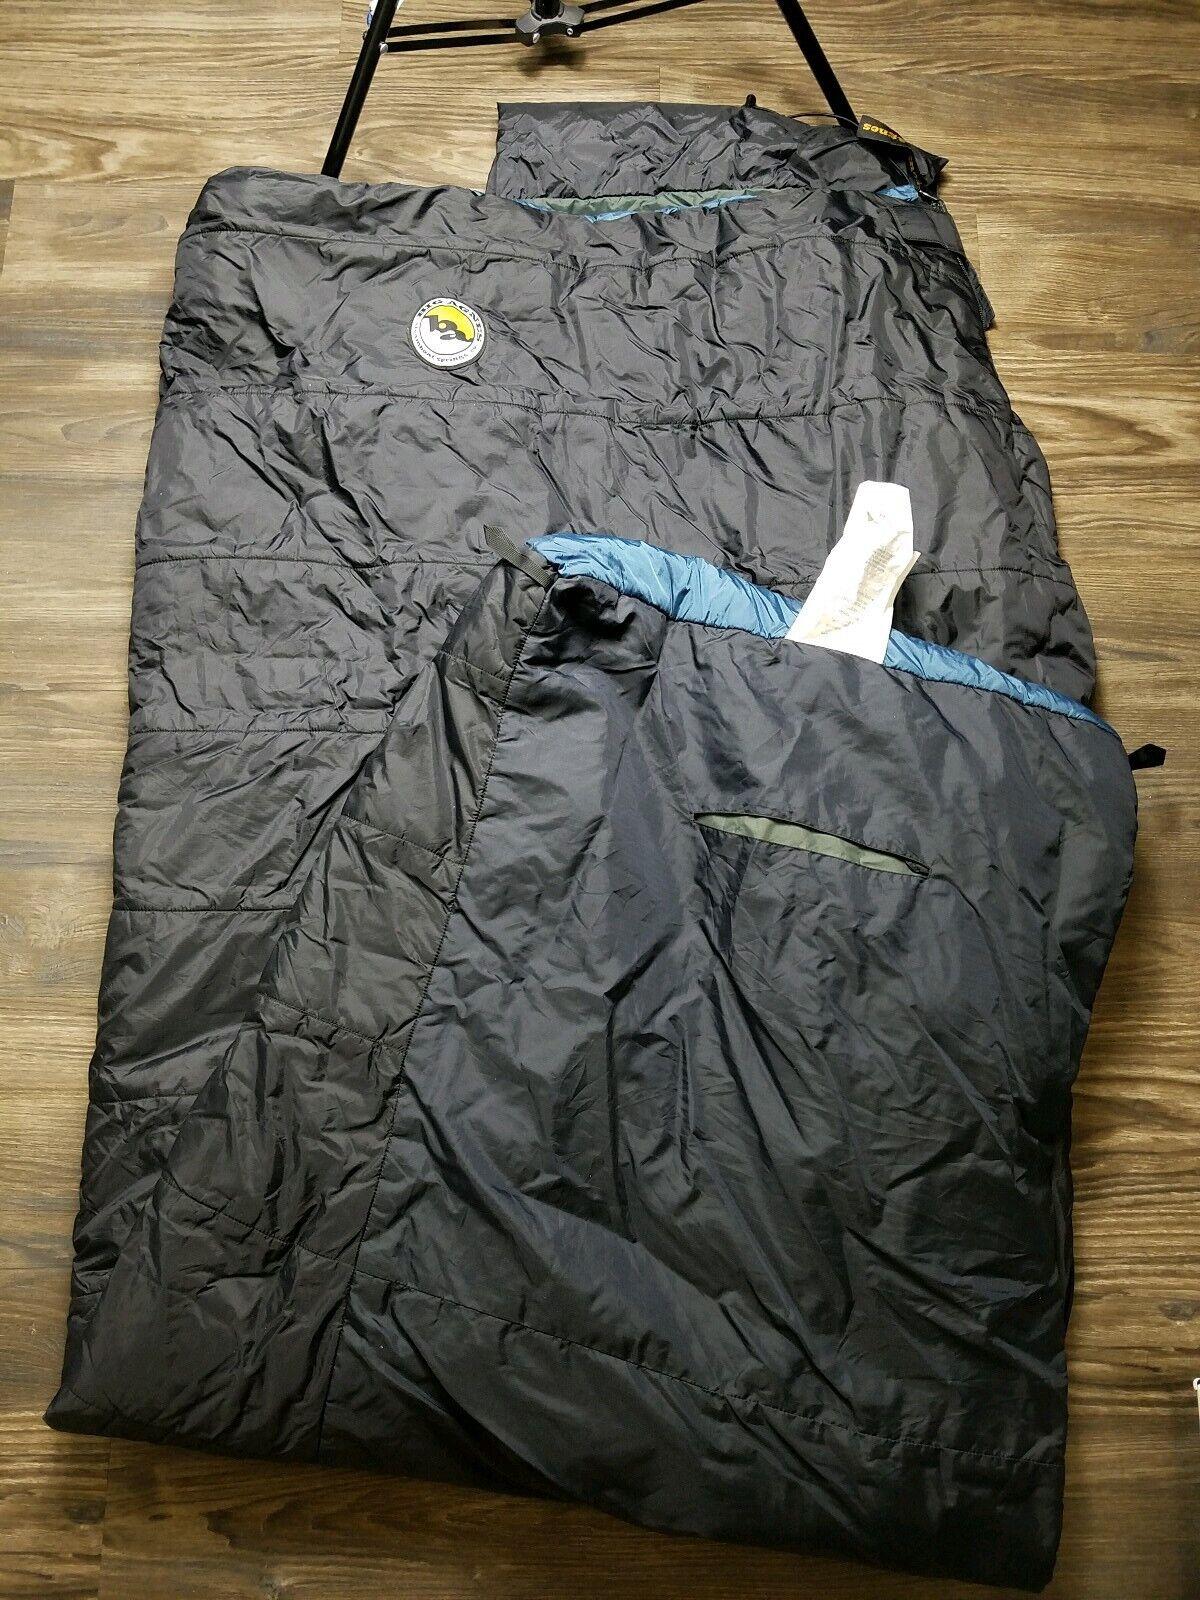 Big Agnes Cross Mountain +45 Sleeping Bag - Used